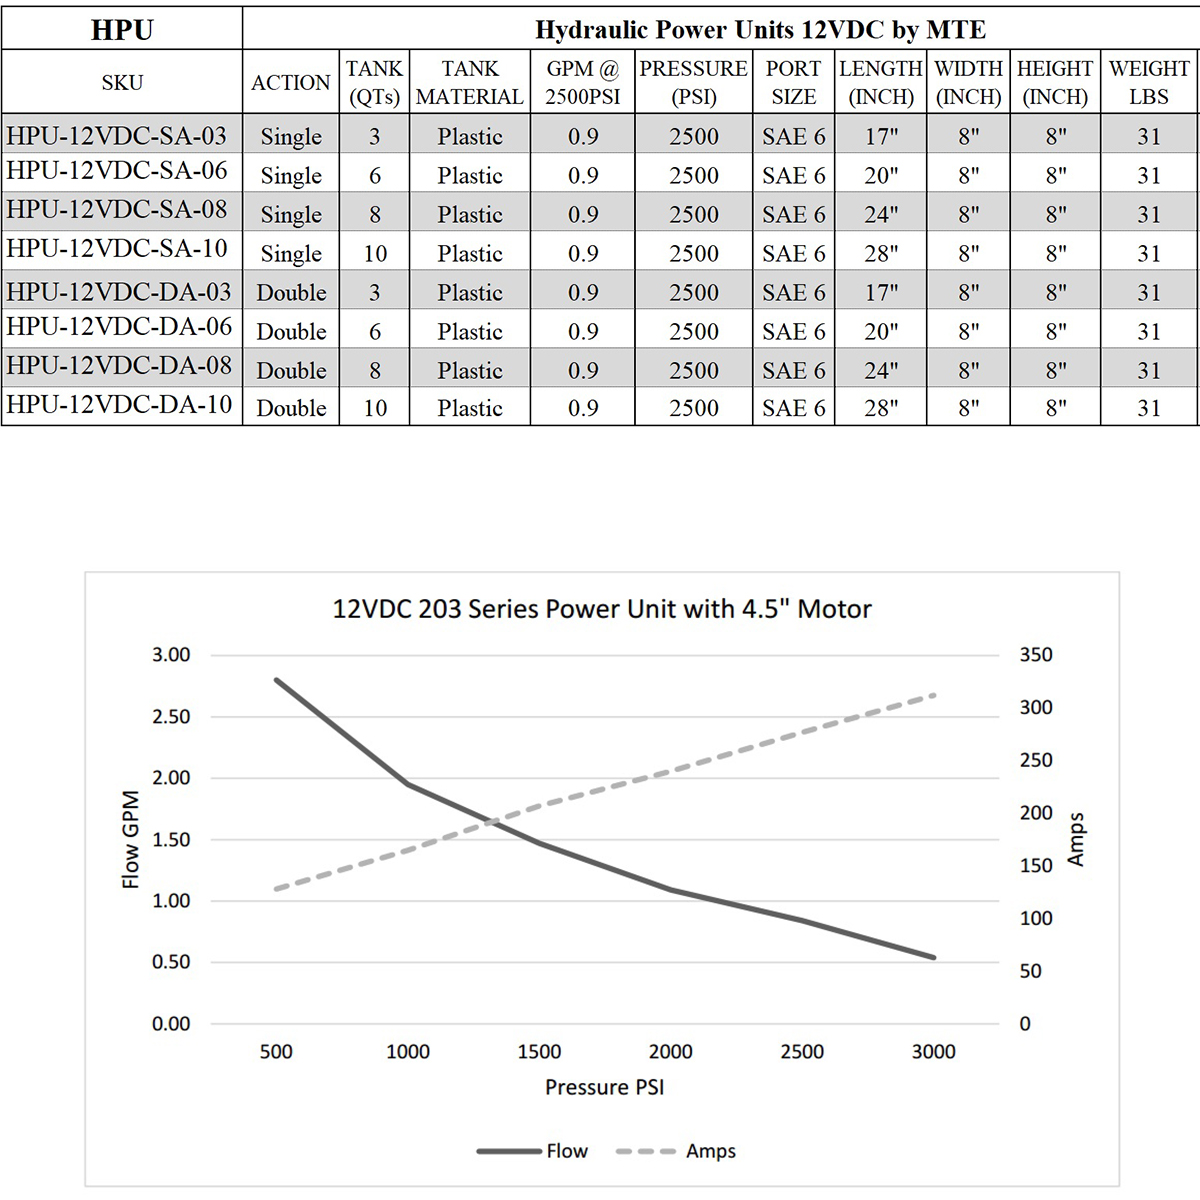 single acting 6 quarts hydraulic power unit 12V DC by MTE